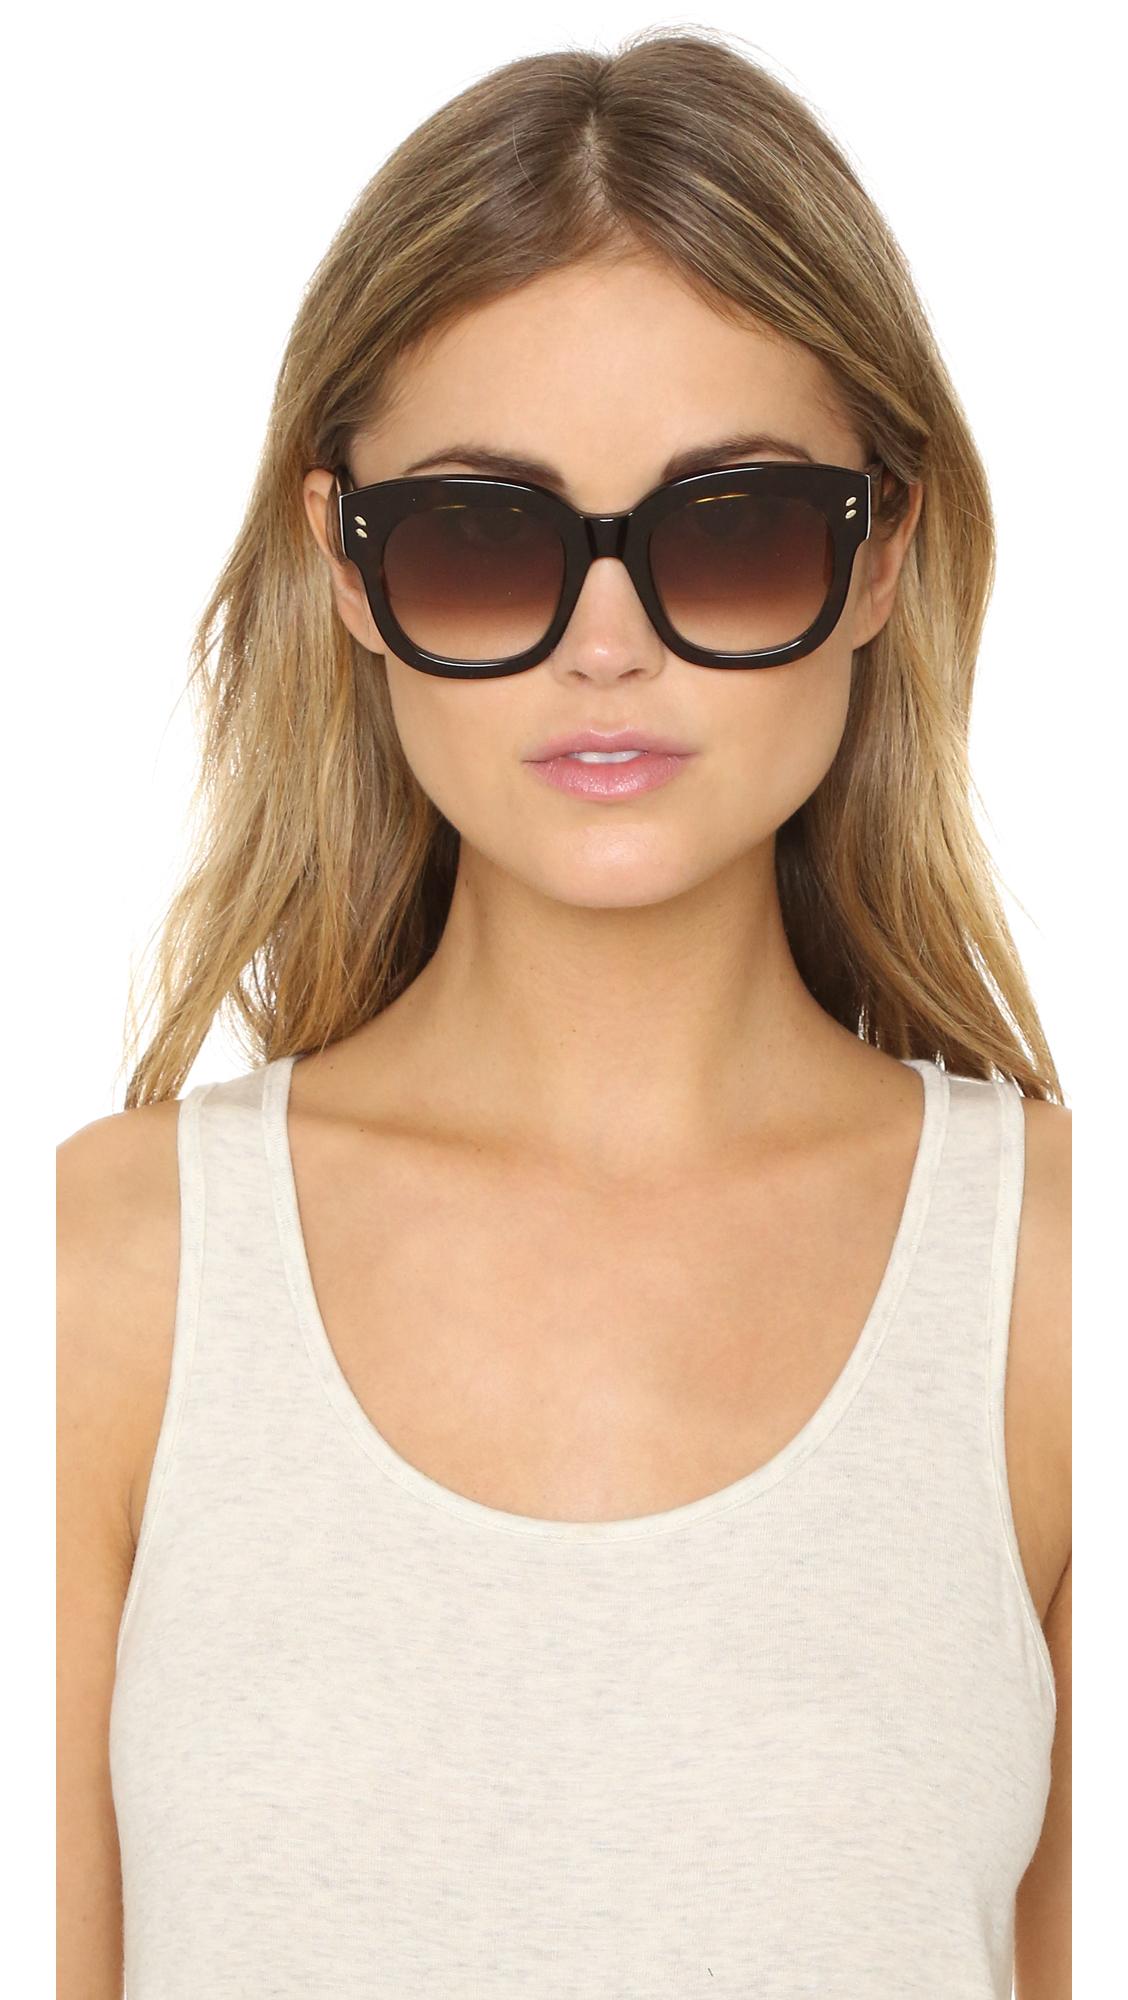 Maui Jim Warranty >> Lyst - Stella McCartney Square Sunglasses in Brown